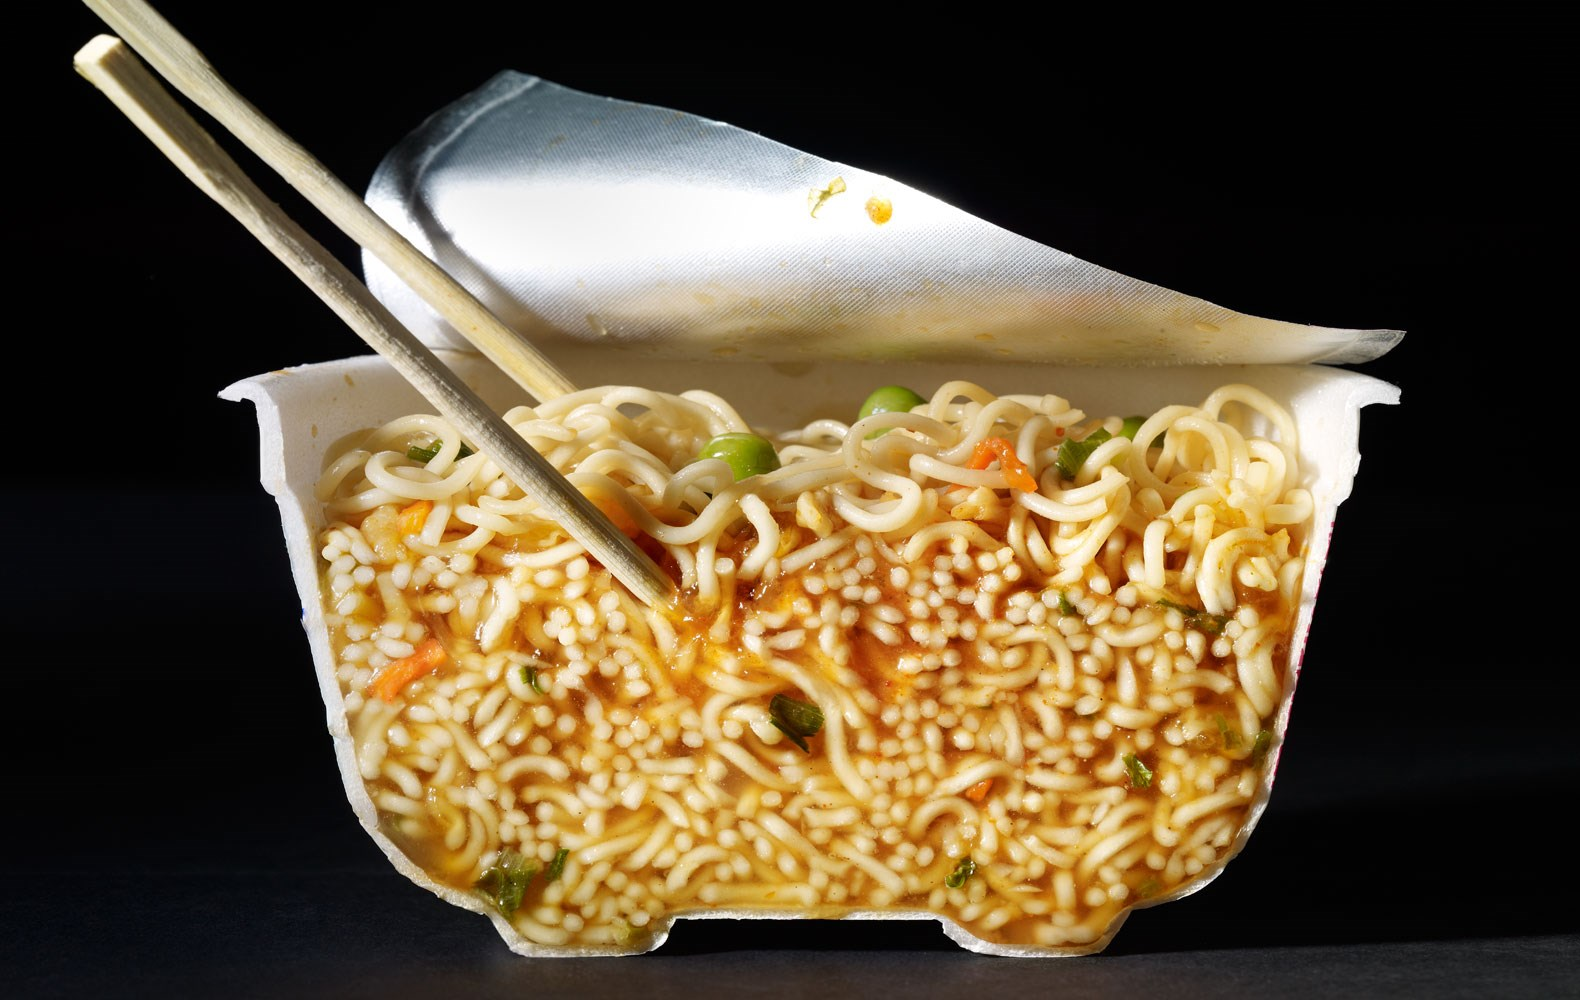 original_cut-food-3